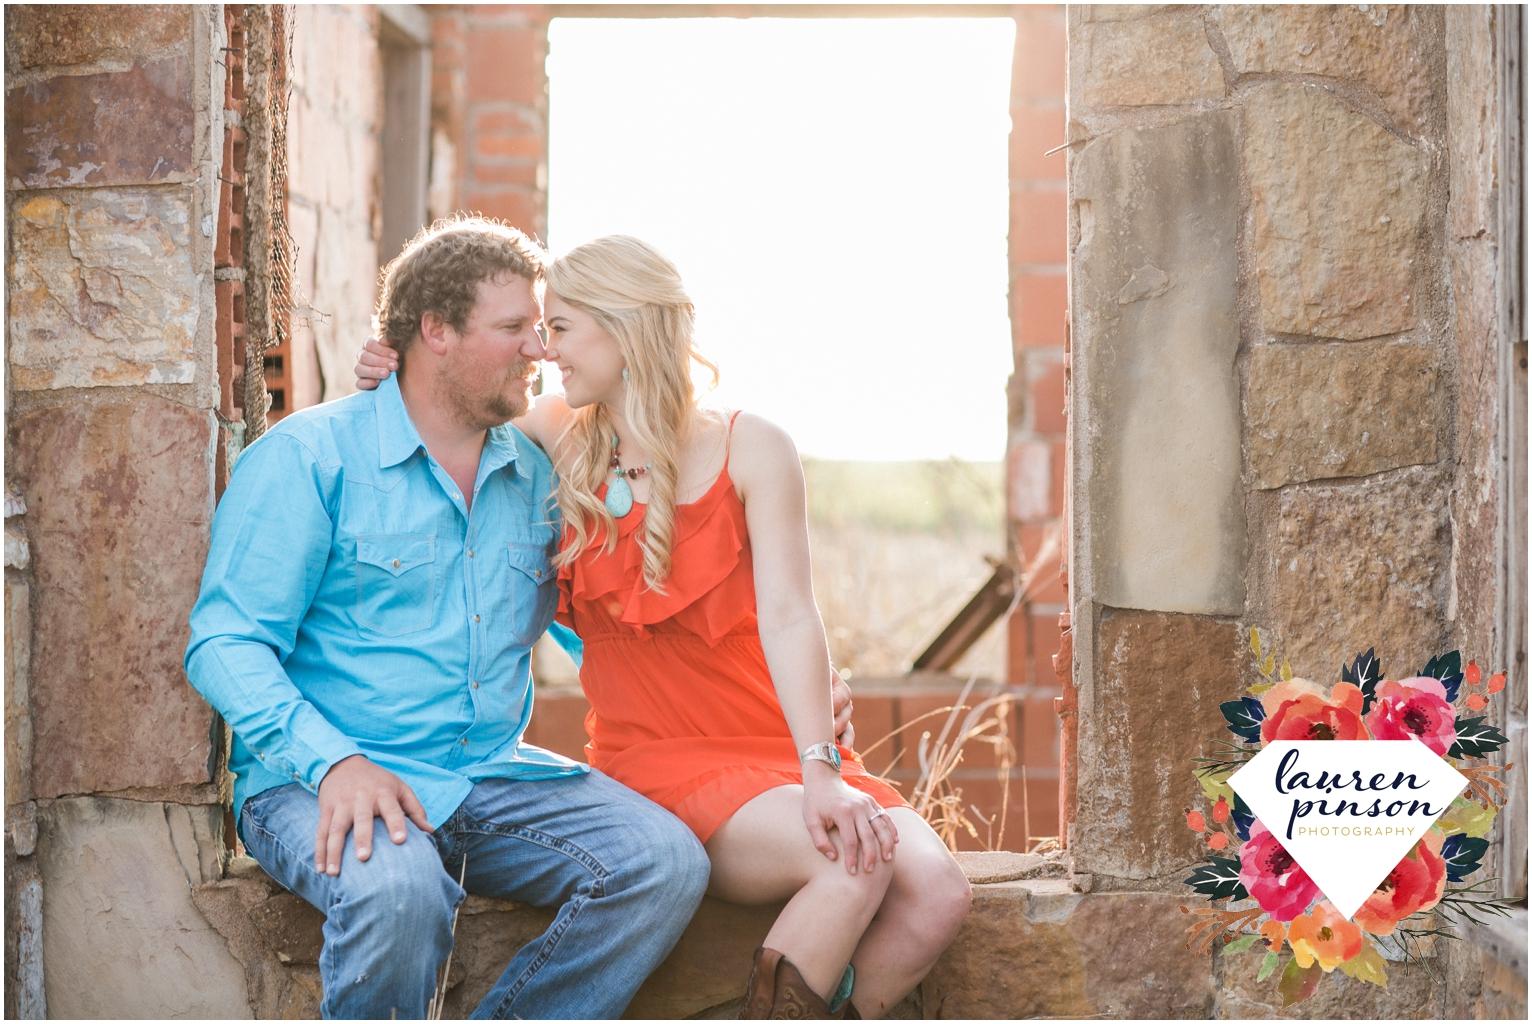 wichita-falls-wedding-photographer-engagement-session-texas-photography-oklahoma-engagement-wedding-photography_0638.jpg